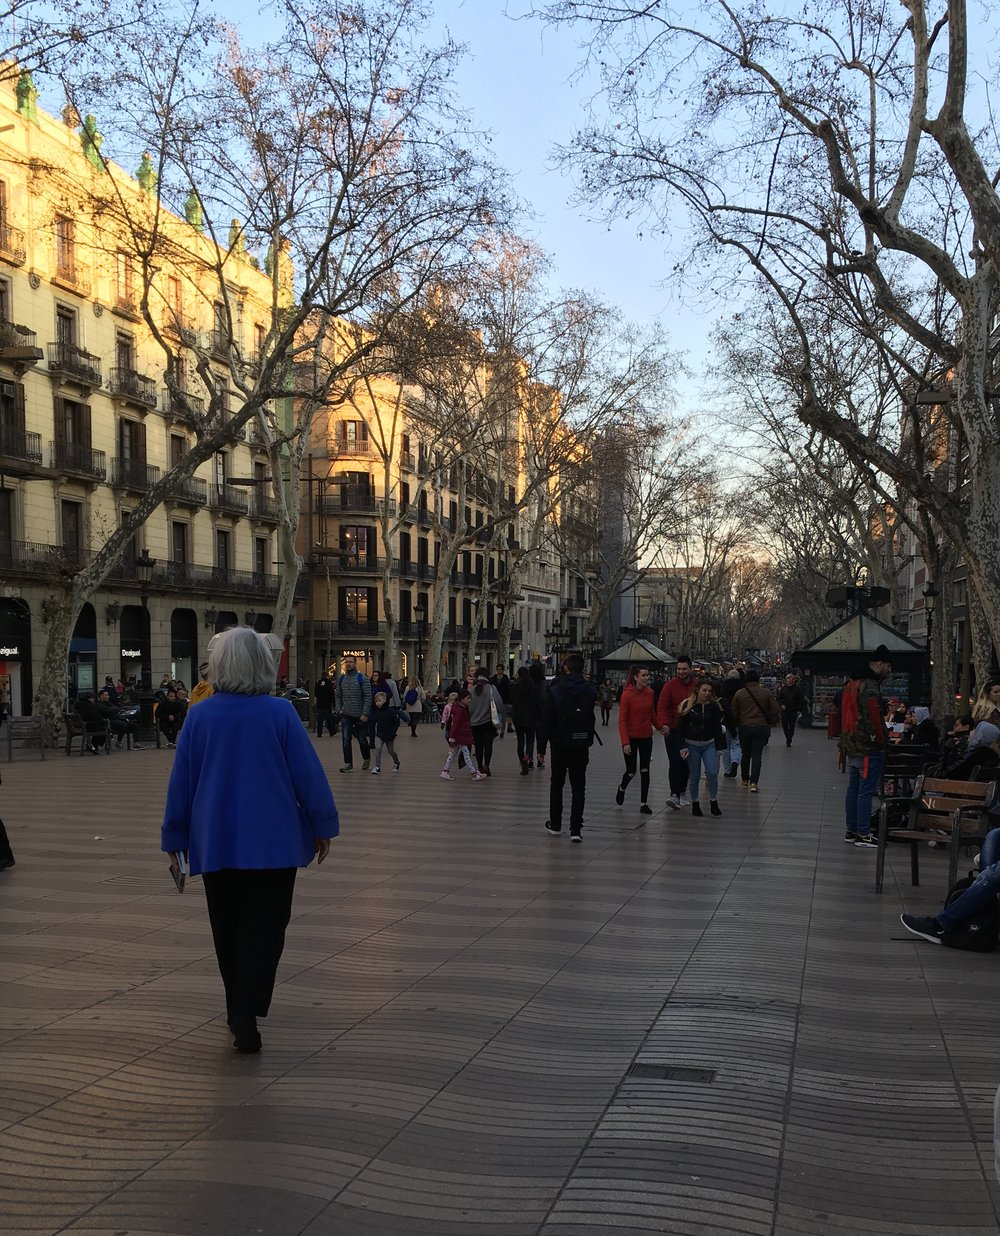 Strolling La Rambla (that's my friend Martha in the blue coat)